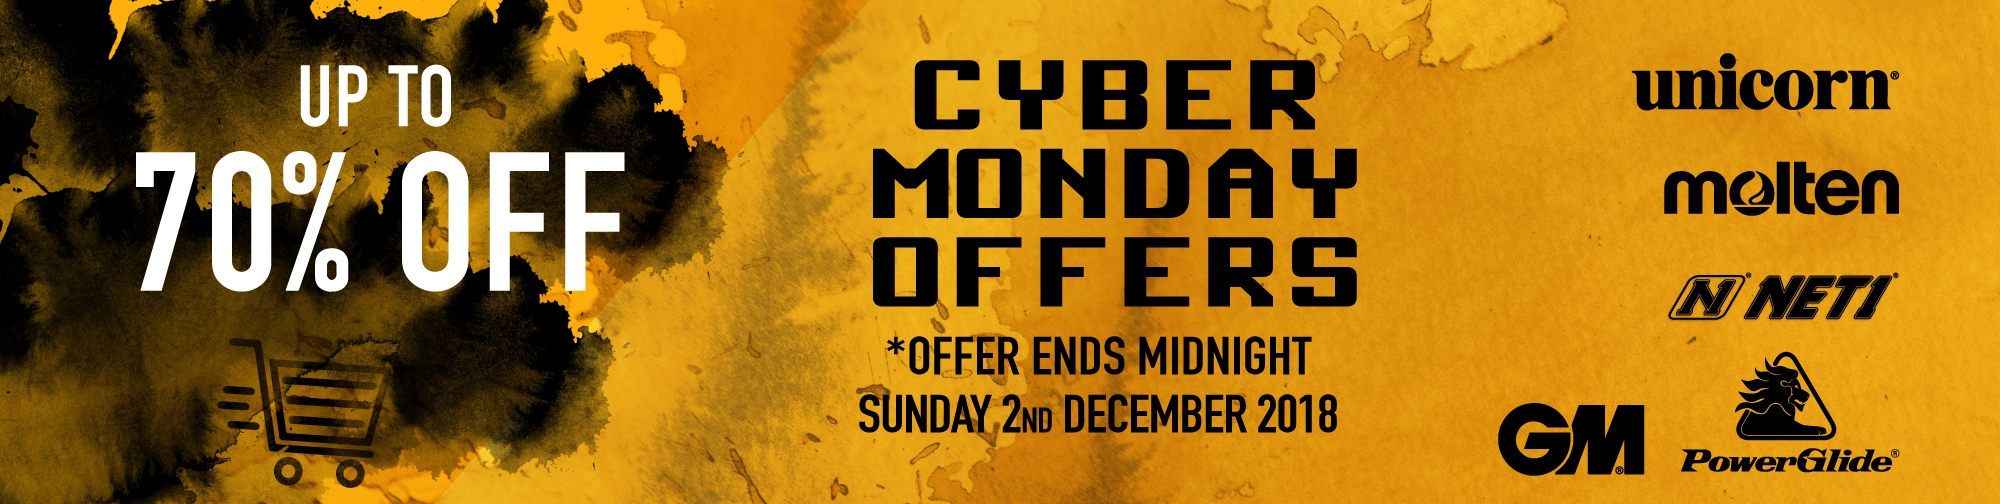 NET1 Cyber Monday Offers